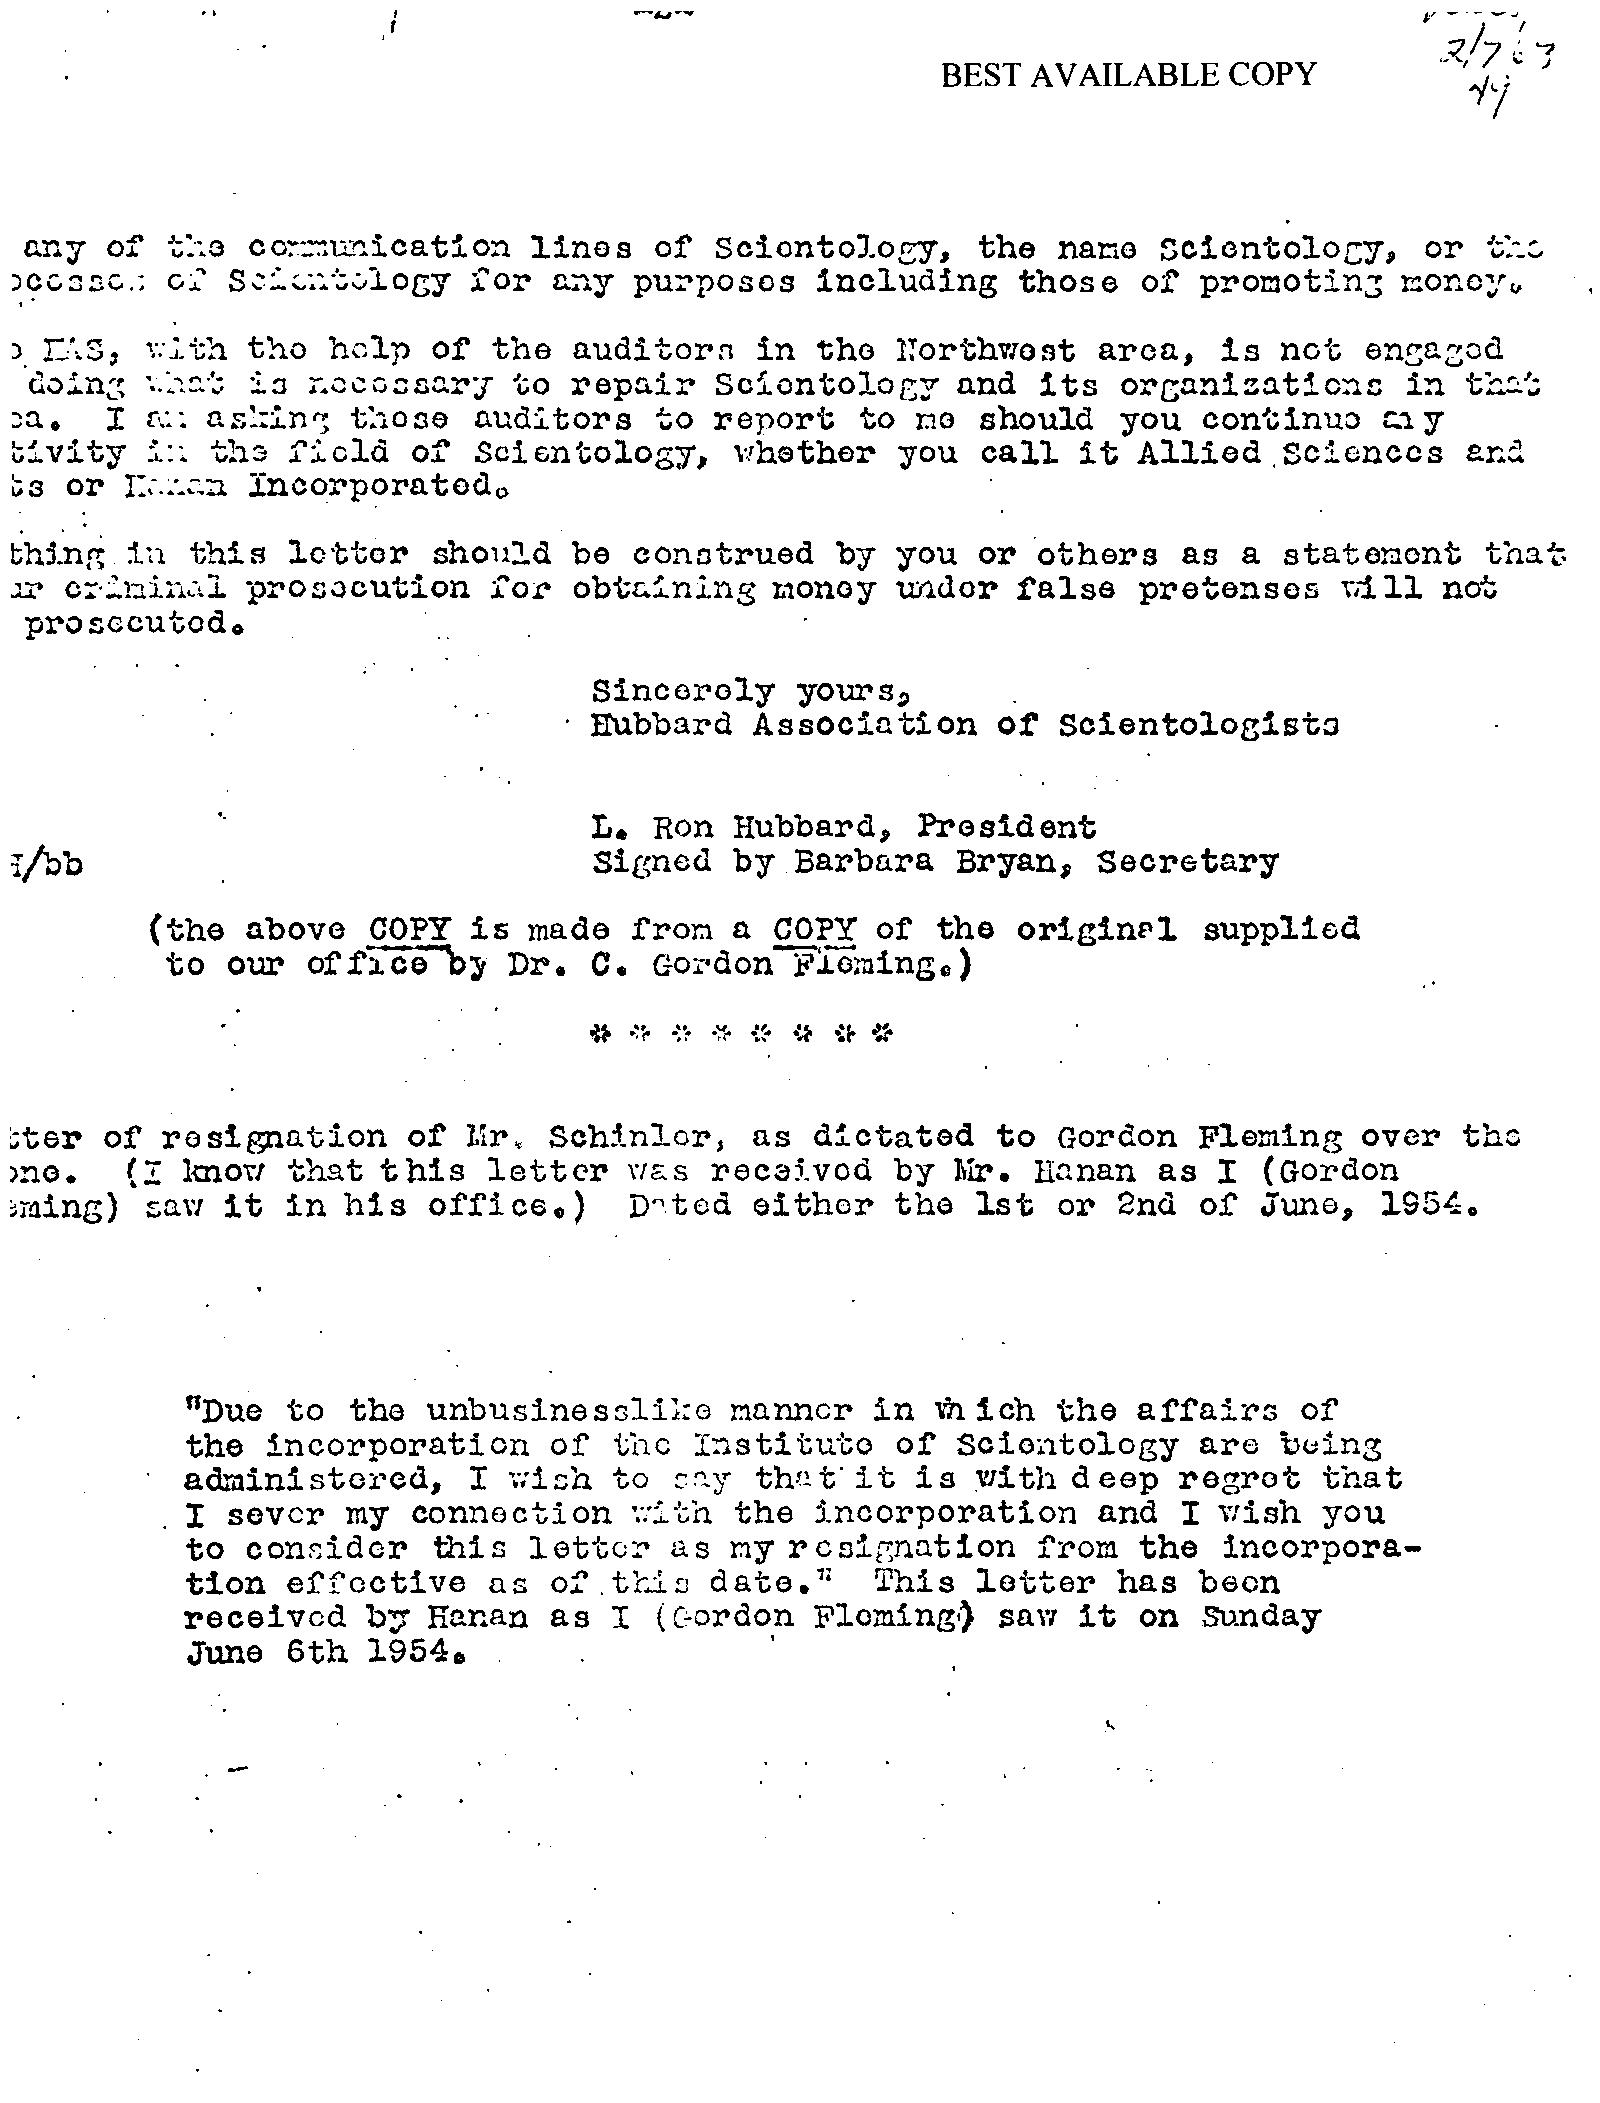 spokane history the institute of scientology - L Ron Hubbard Lebenslauf